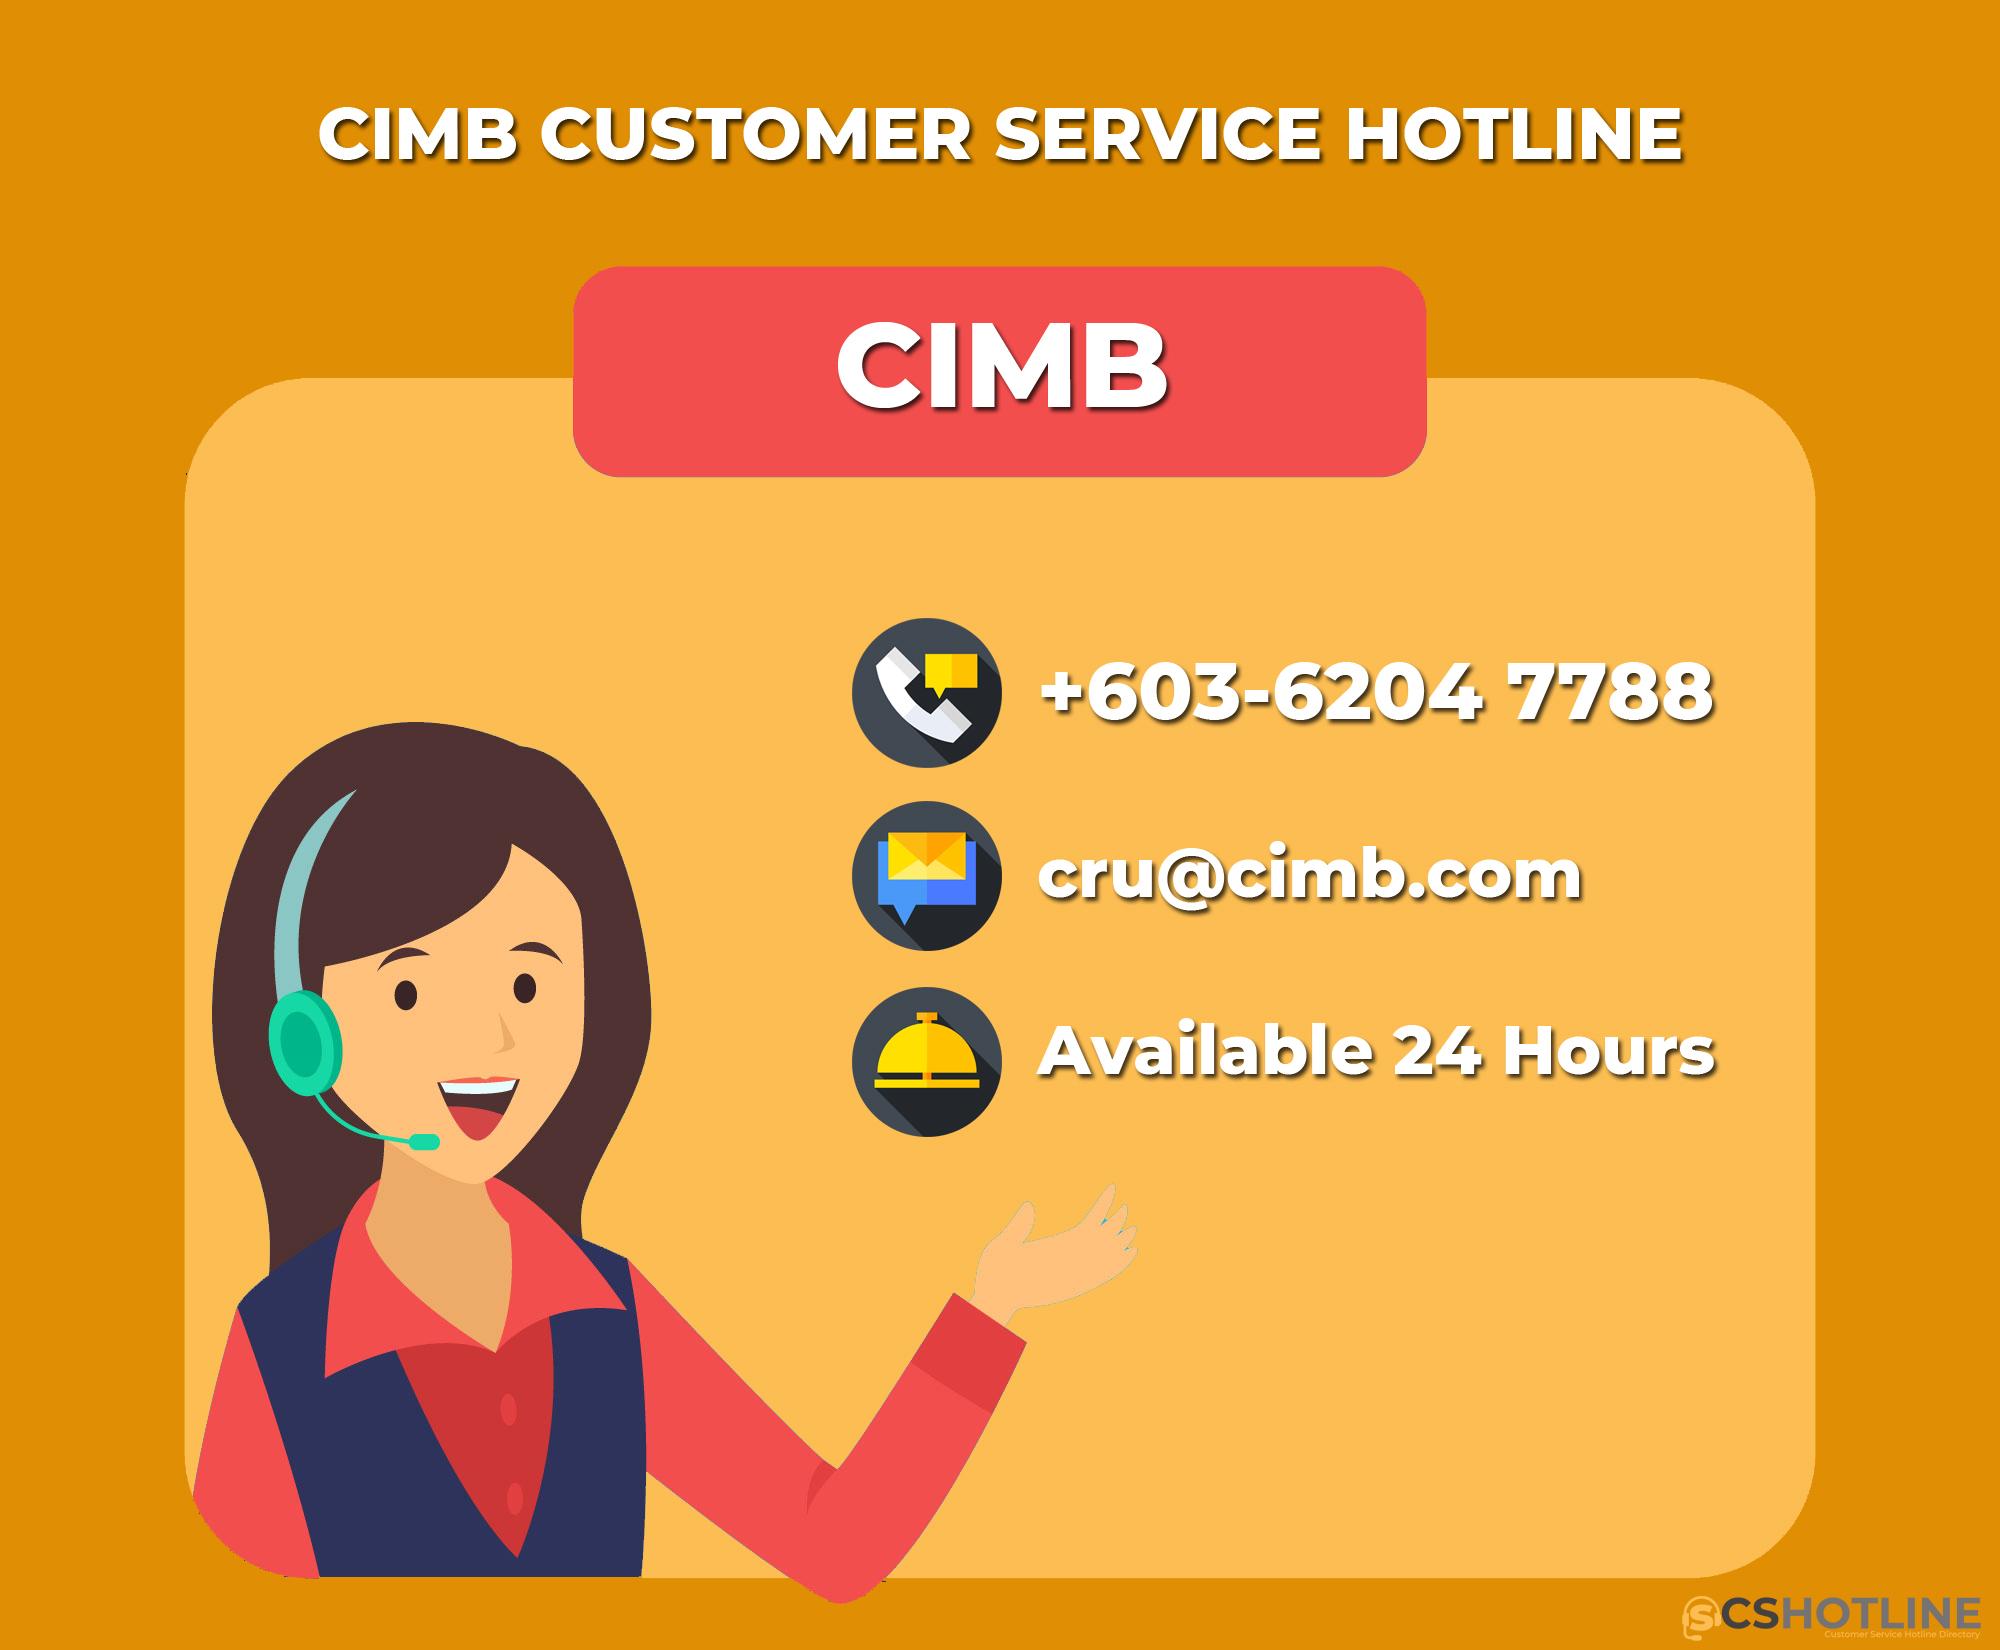 CIMB Customer Service Hotline